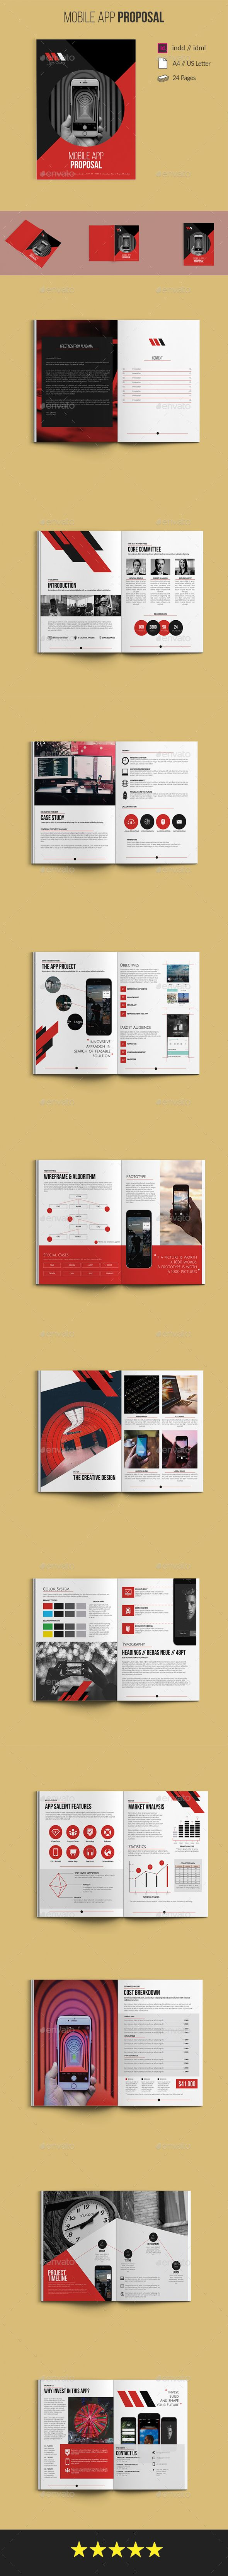 mobile app proposal